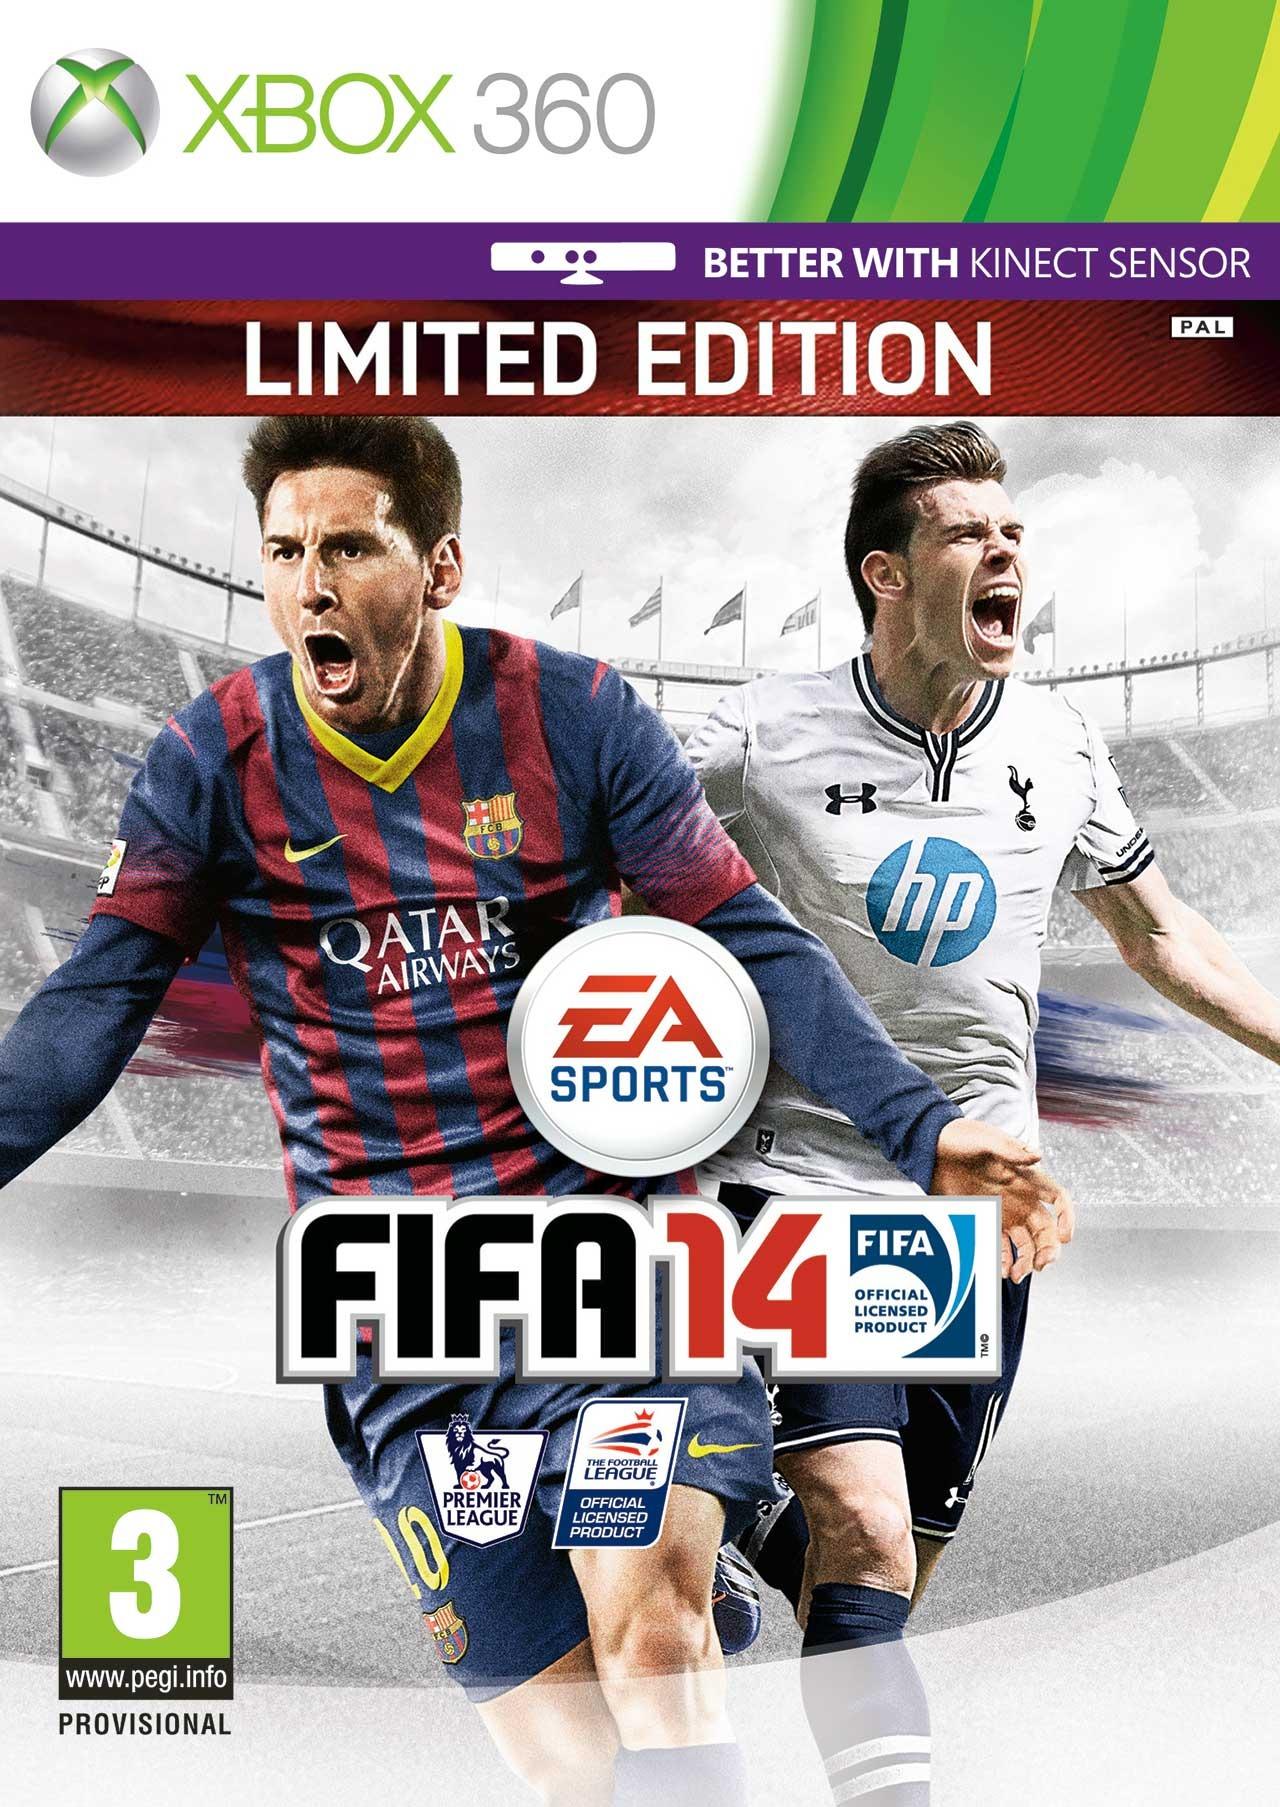 FIFA Soccer 14 cover 360 EURO